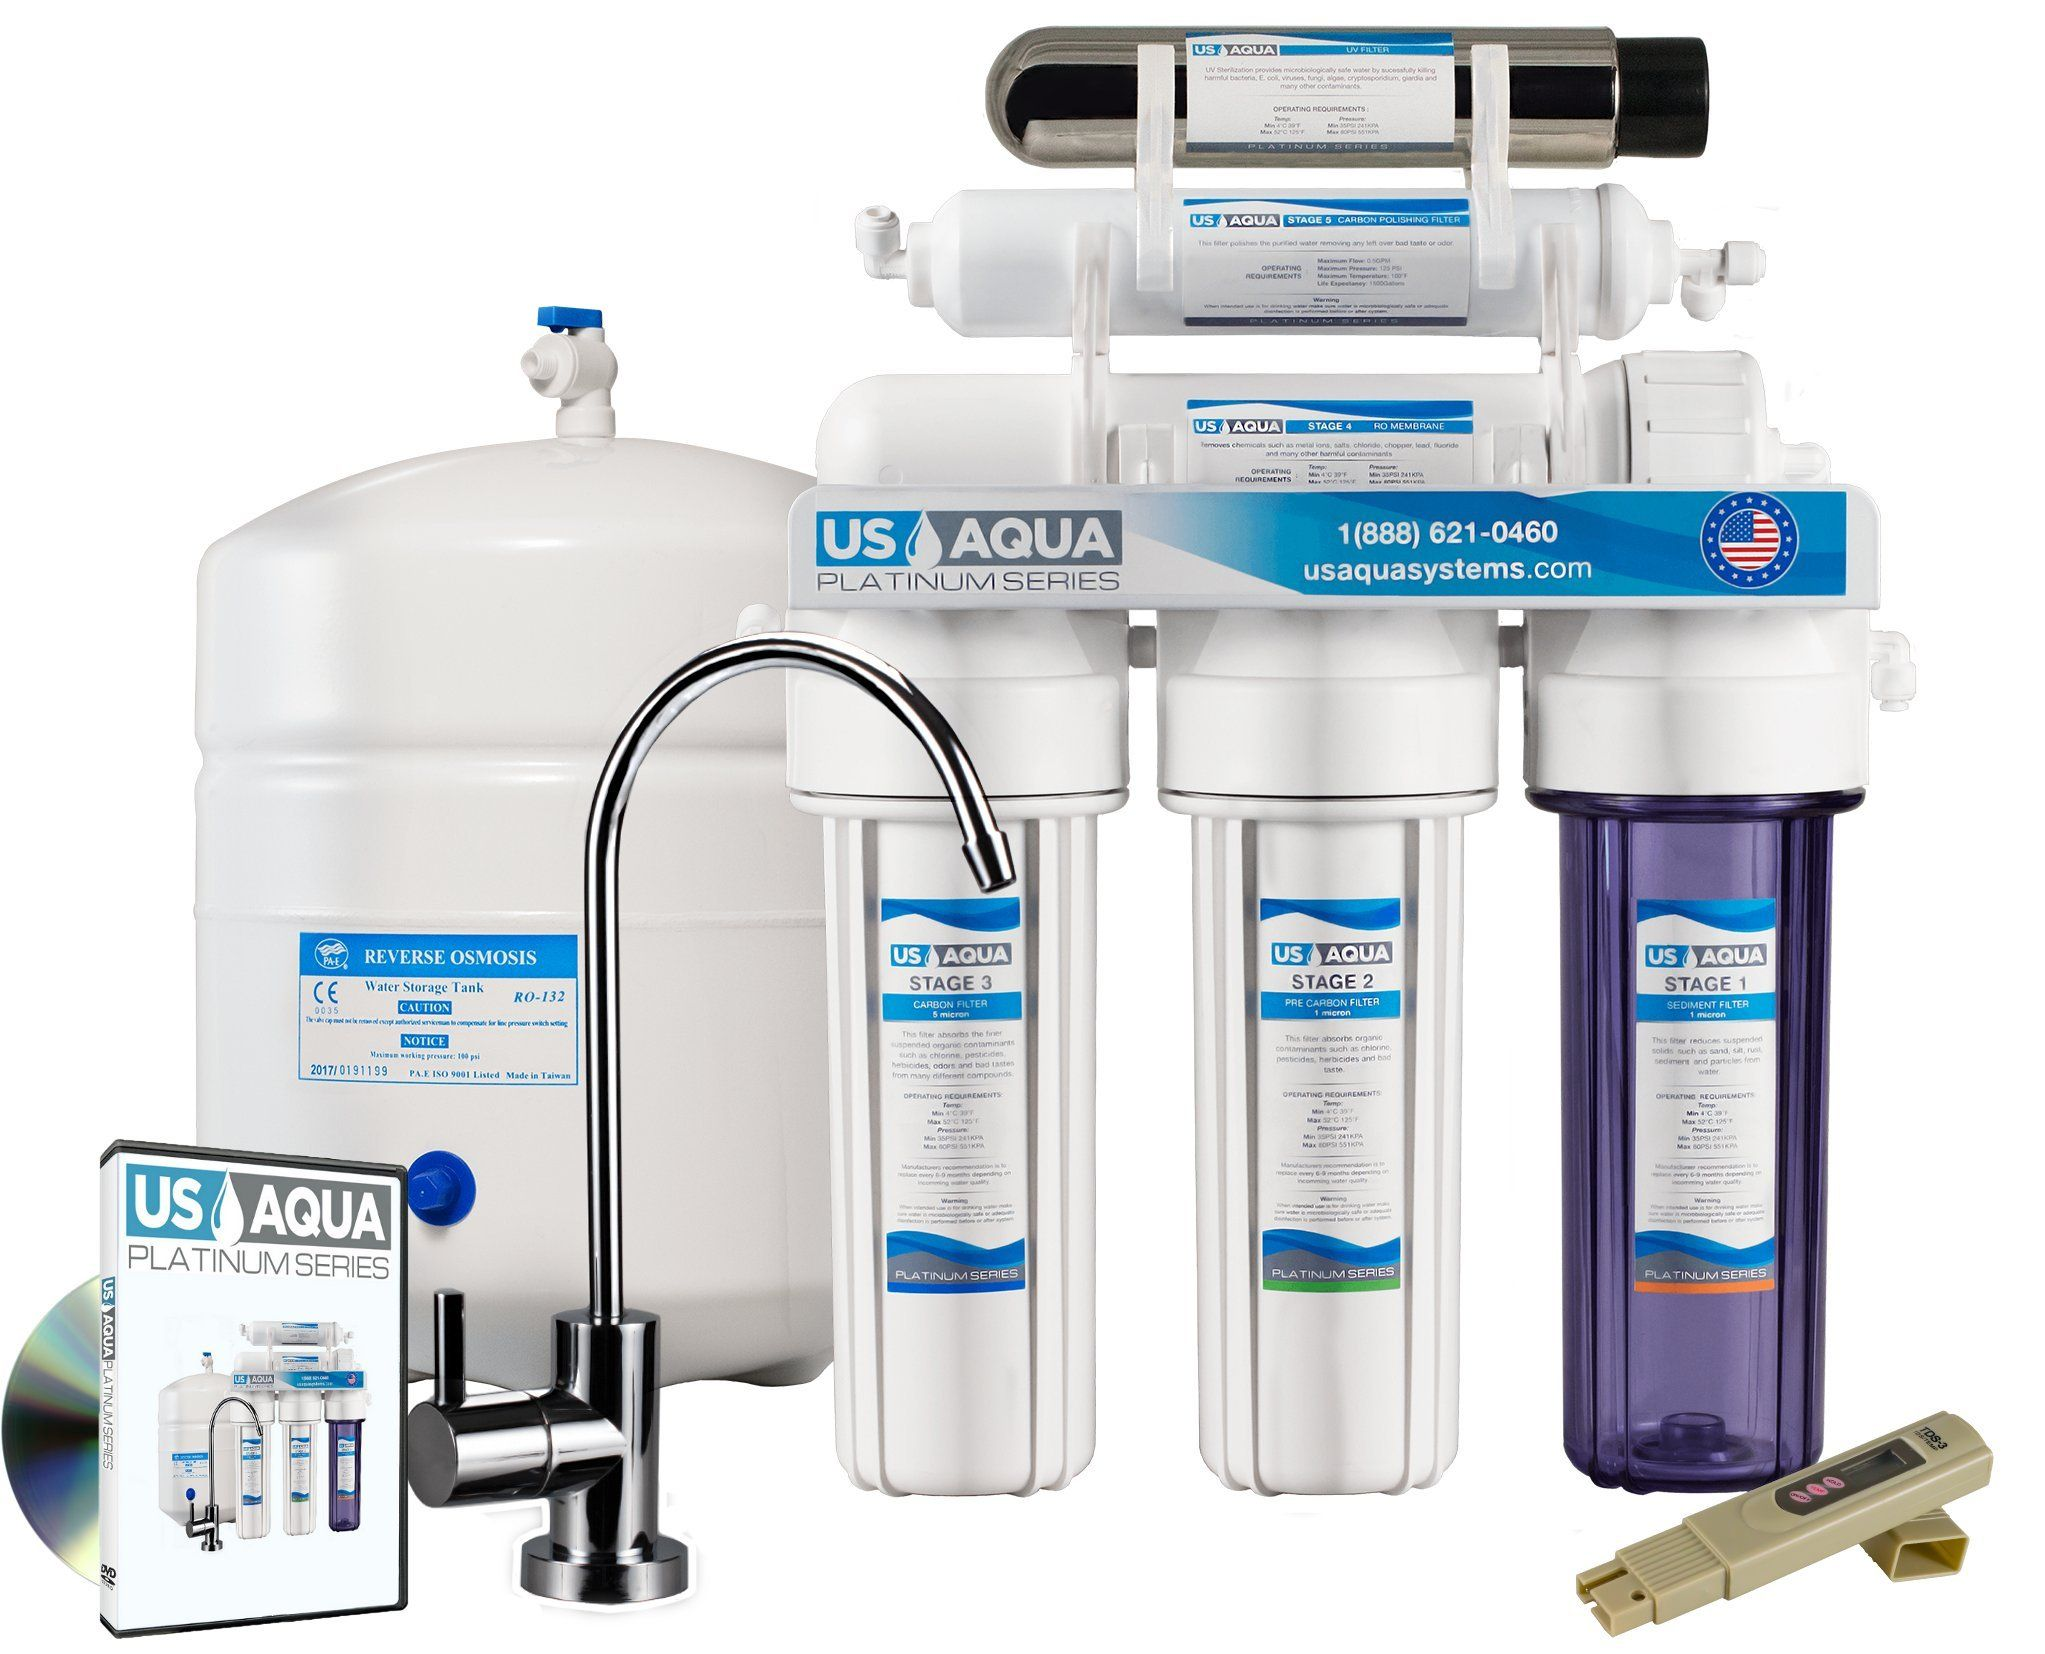 Us Aqua Platinum Series Deluxe High Capacity 100gpd Under Sink Reverse Osmosis Purifier Drinking Water Filter S Water Filters System Sink Drinking Water Filter